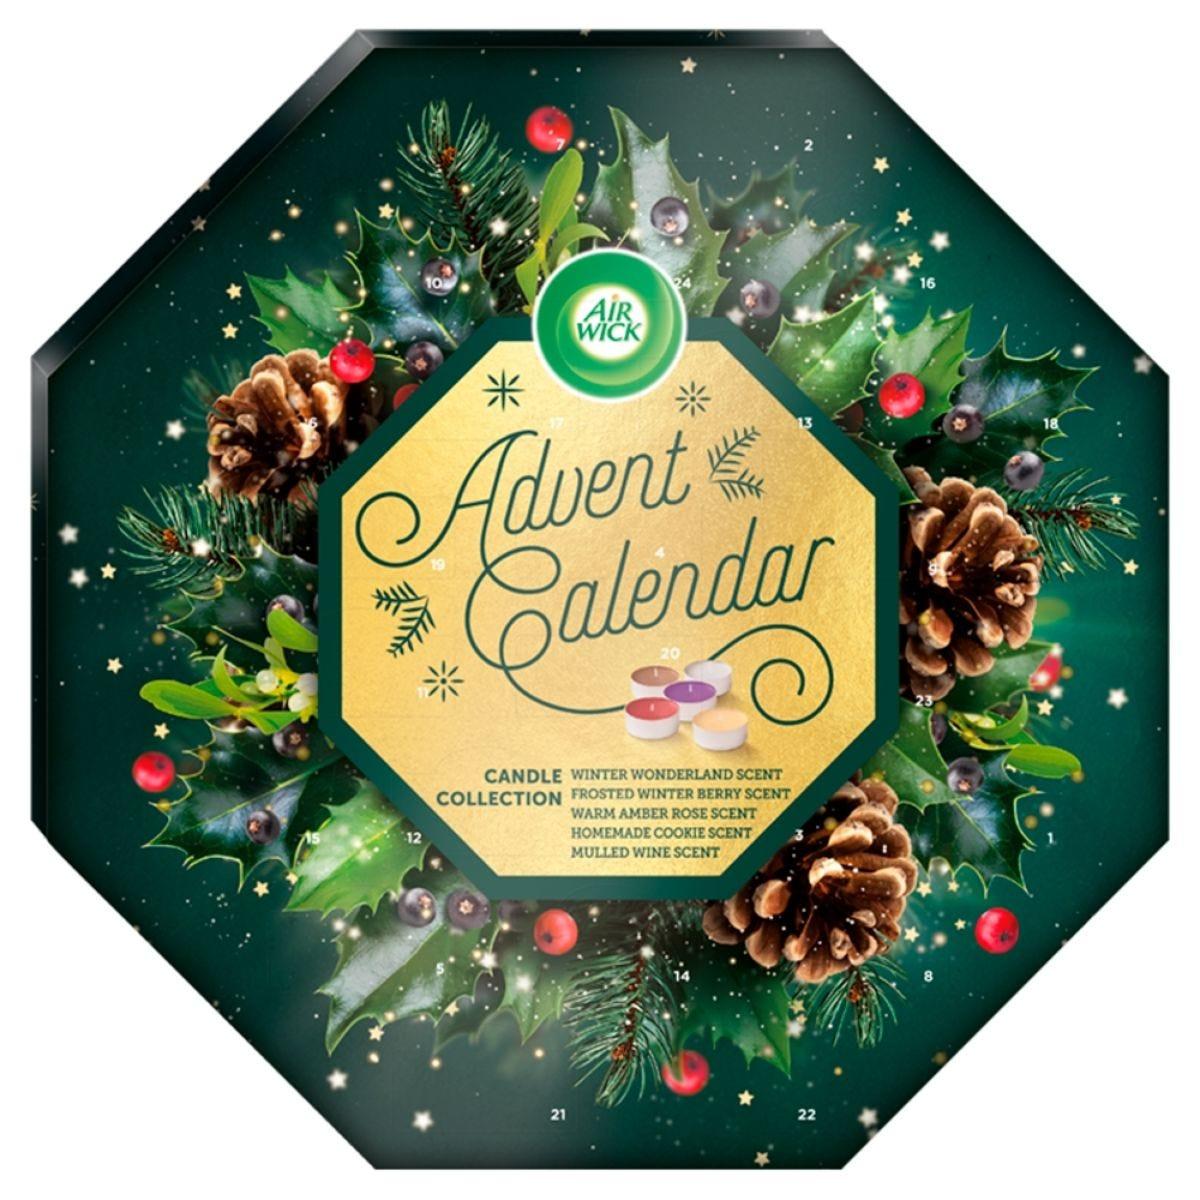 Airwick Christmas Candle Advent Calendar 2020